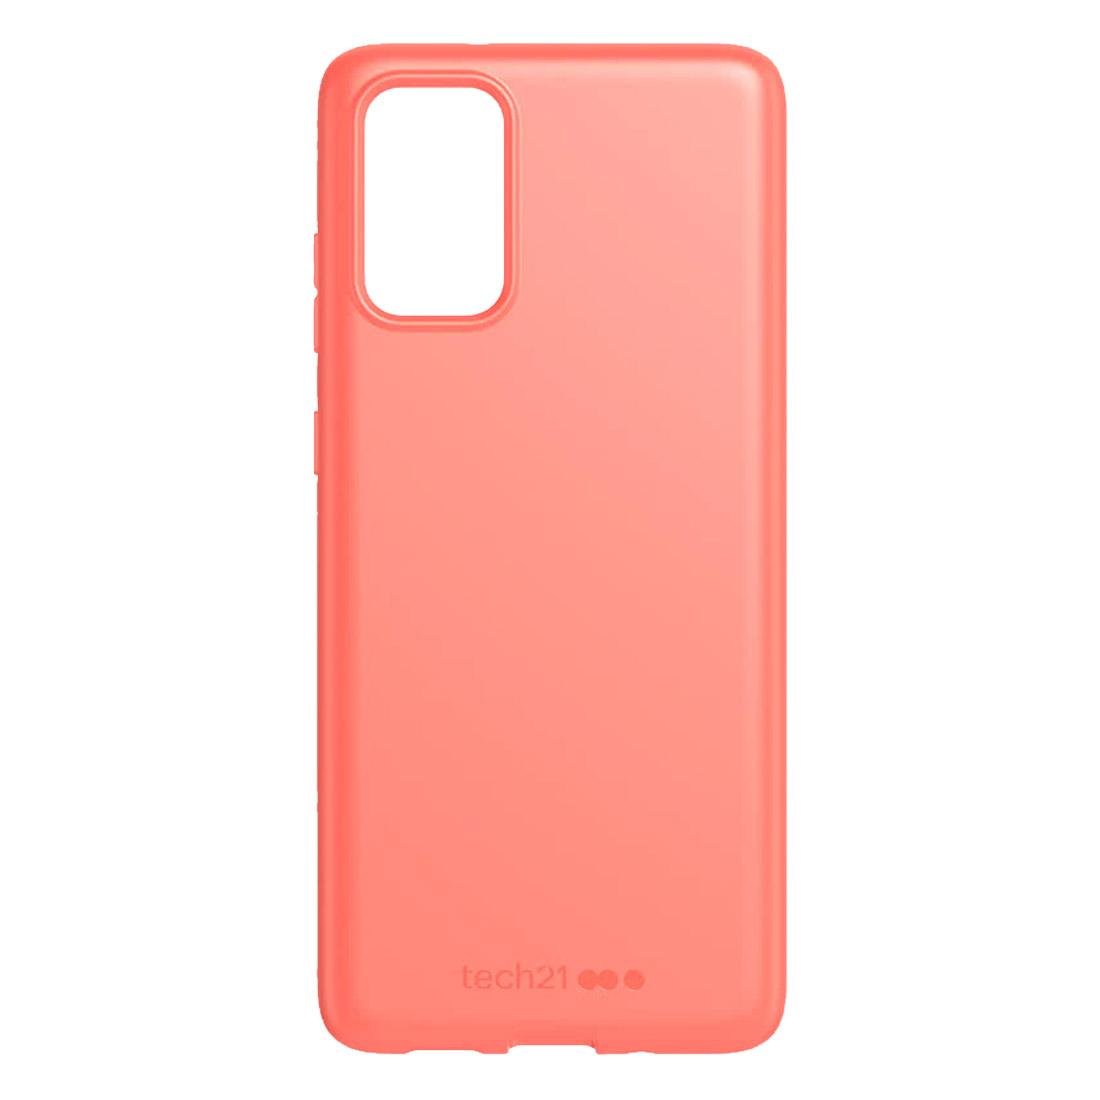 Tech21 Studio Colour Case for Samsung Galaxy S20+ Plus T21-7688 - Coral